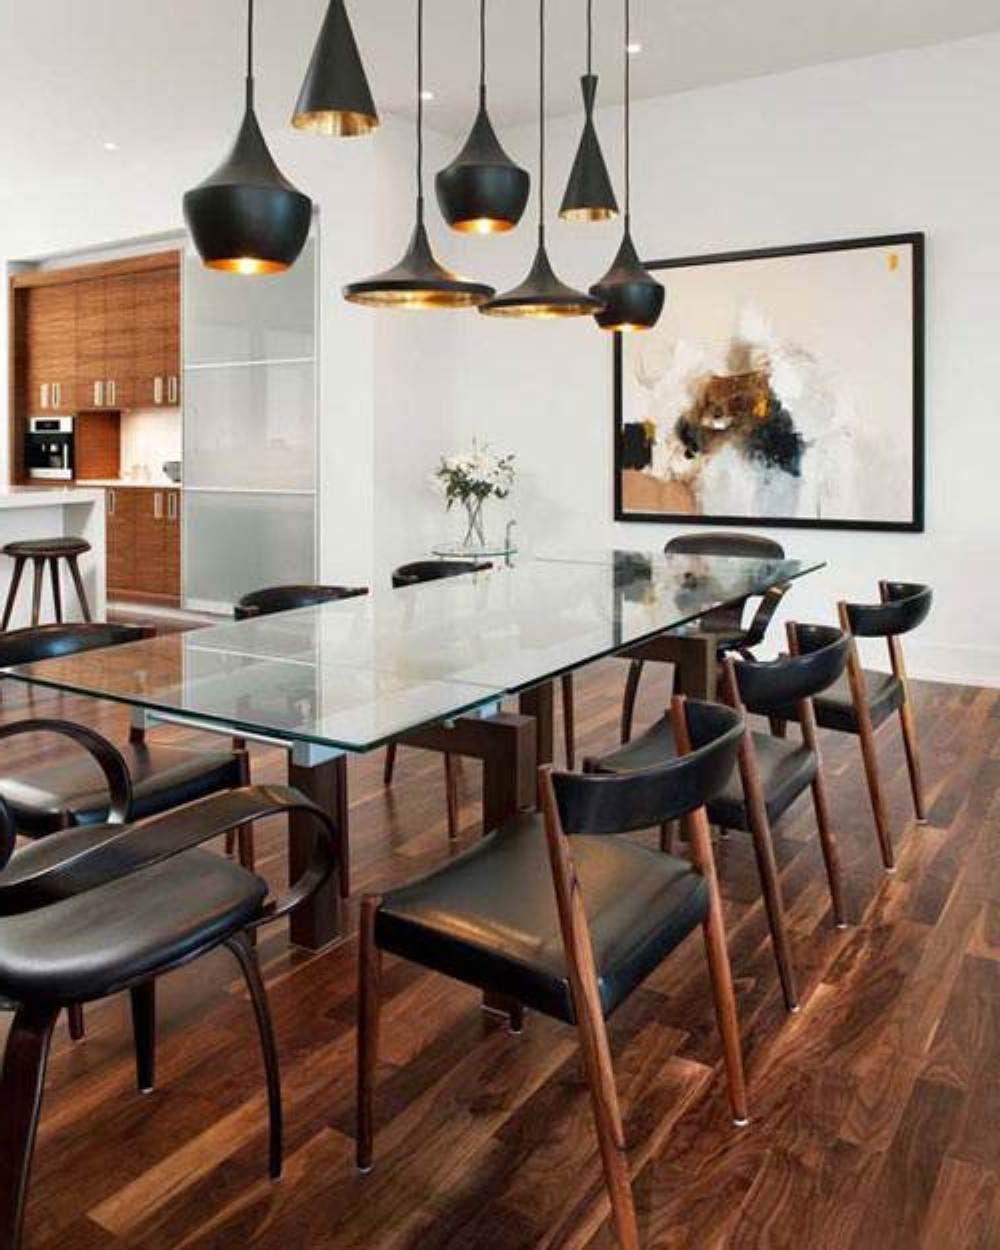 Modern Dining Room Light Fixture Vegrecipes Home Decoration 7